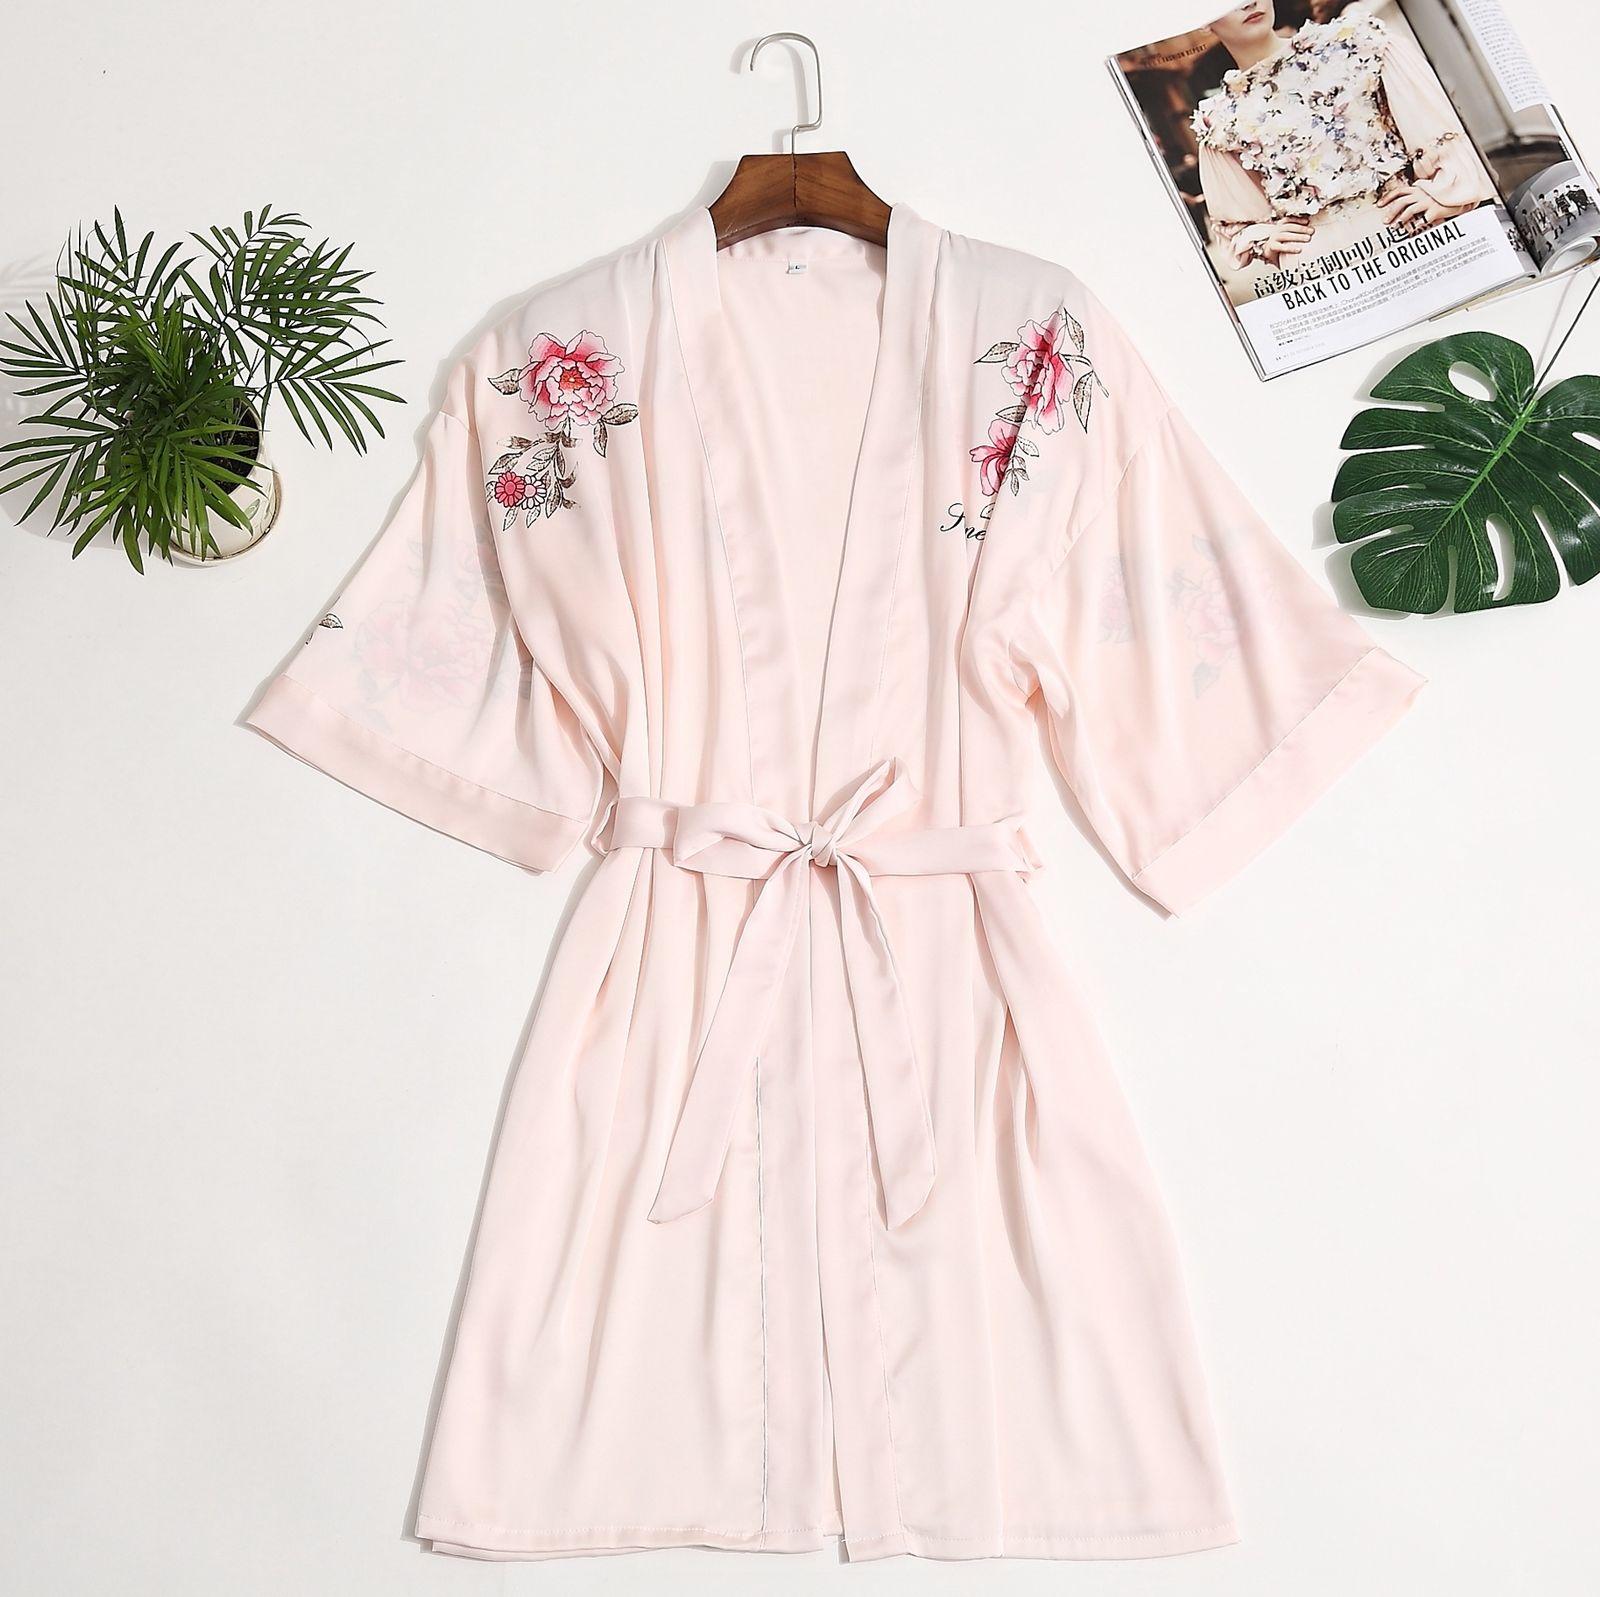 Floral Robe Kimono Women Dressing Gown Half Sleeve Loose Ladies Sleepwear Robes